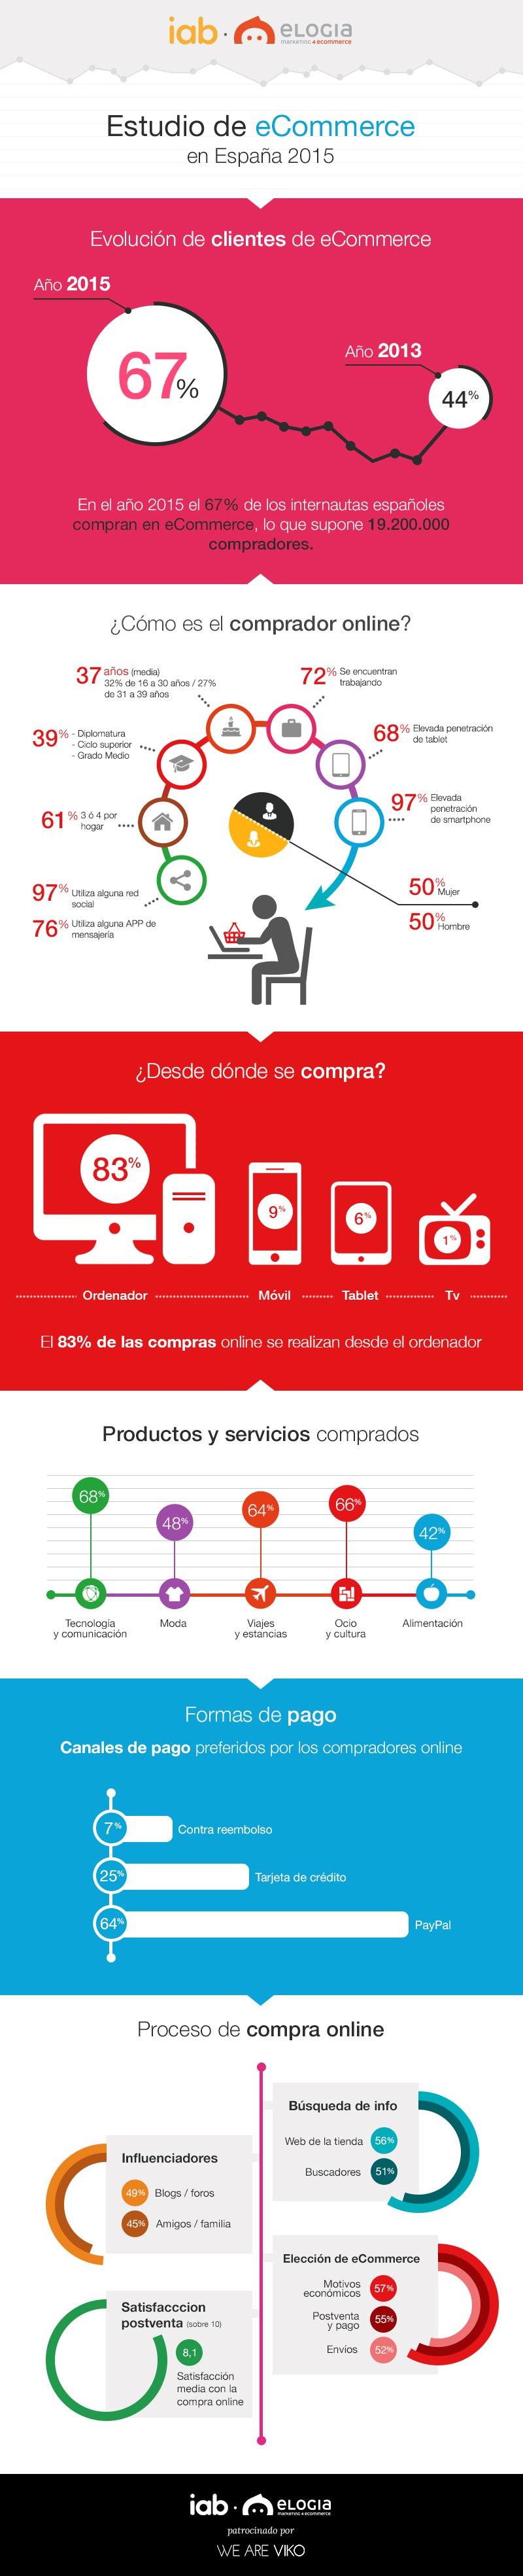 infografia-iab-elogia-2015